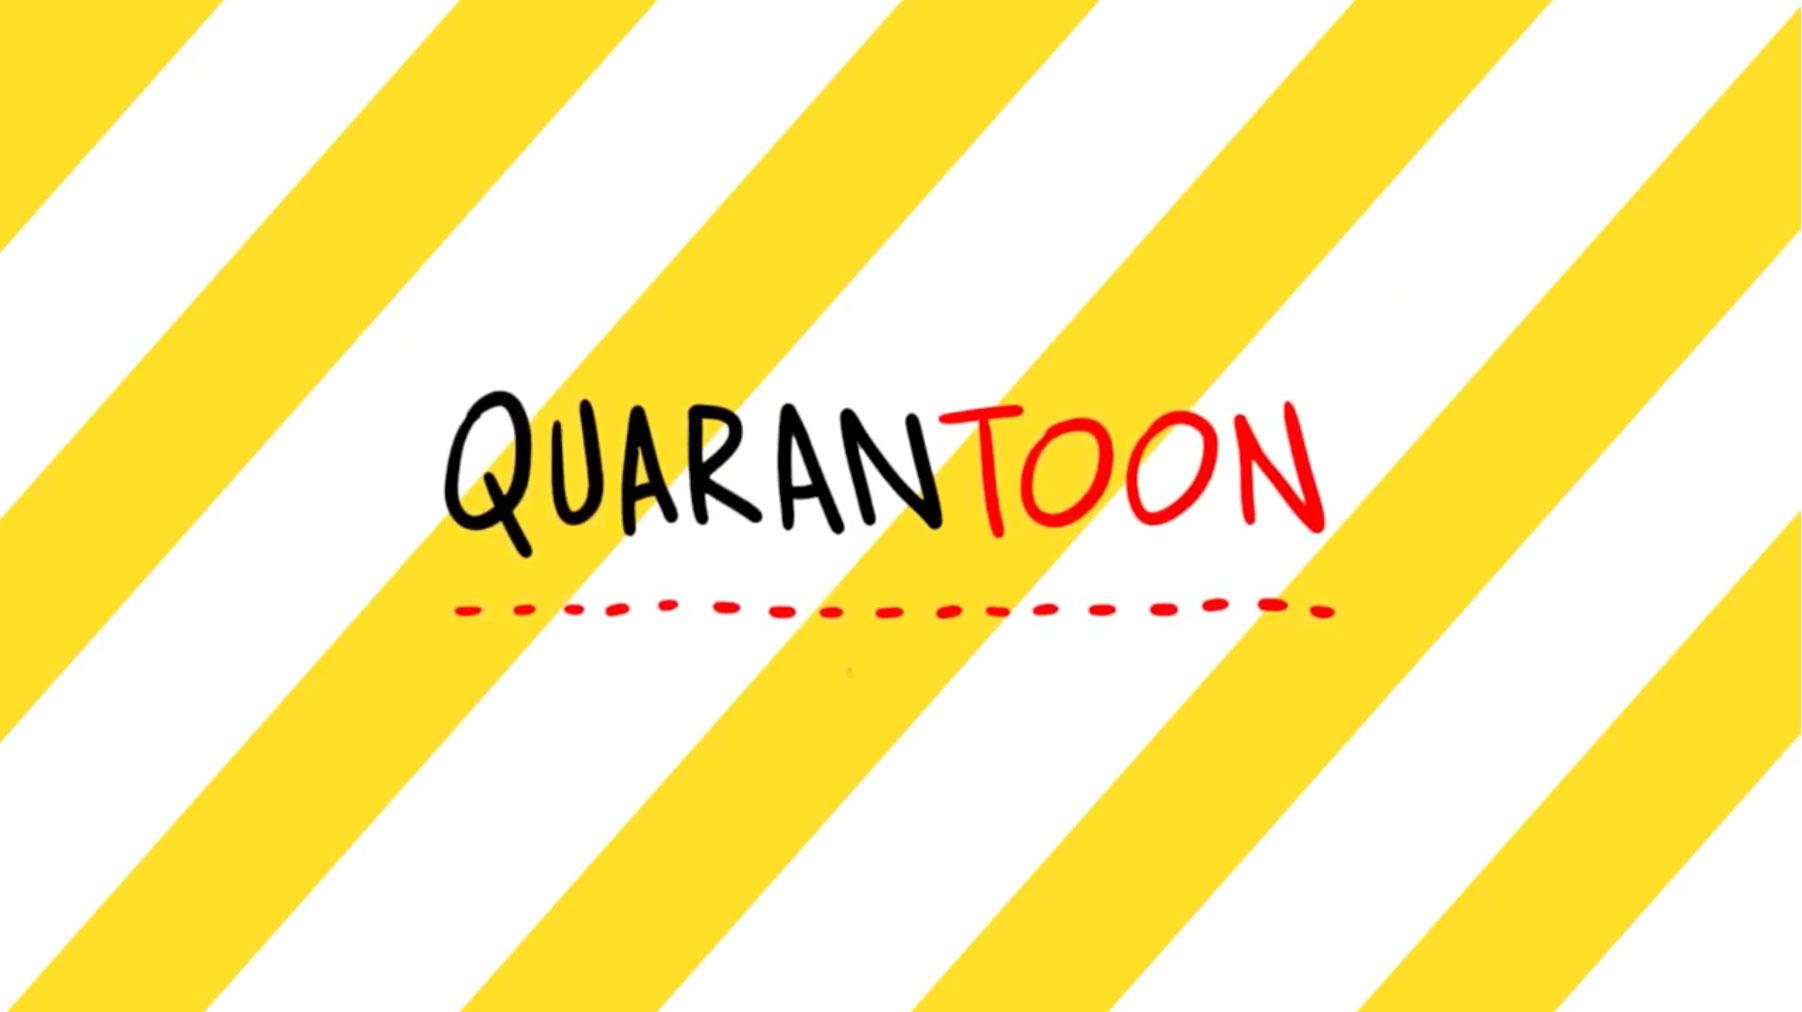 Quarantoon